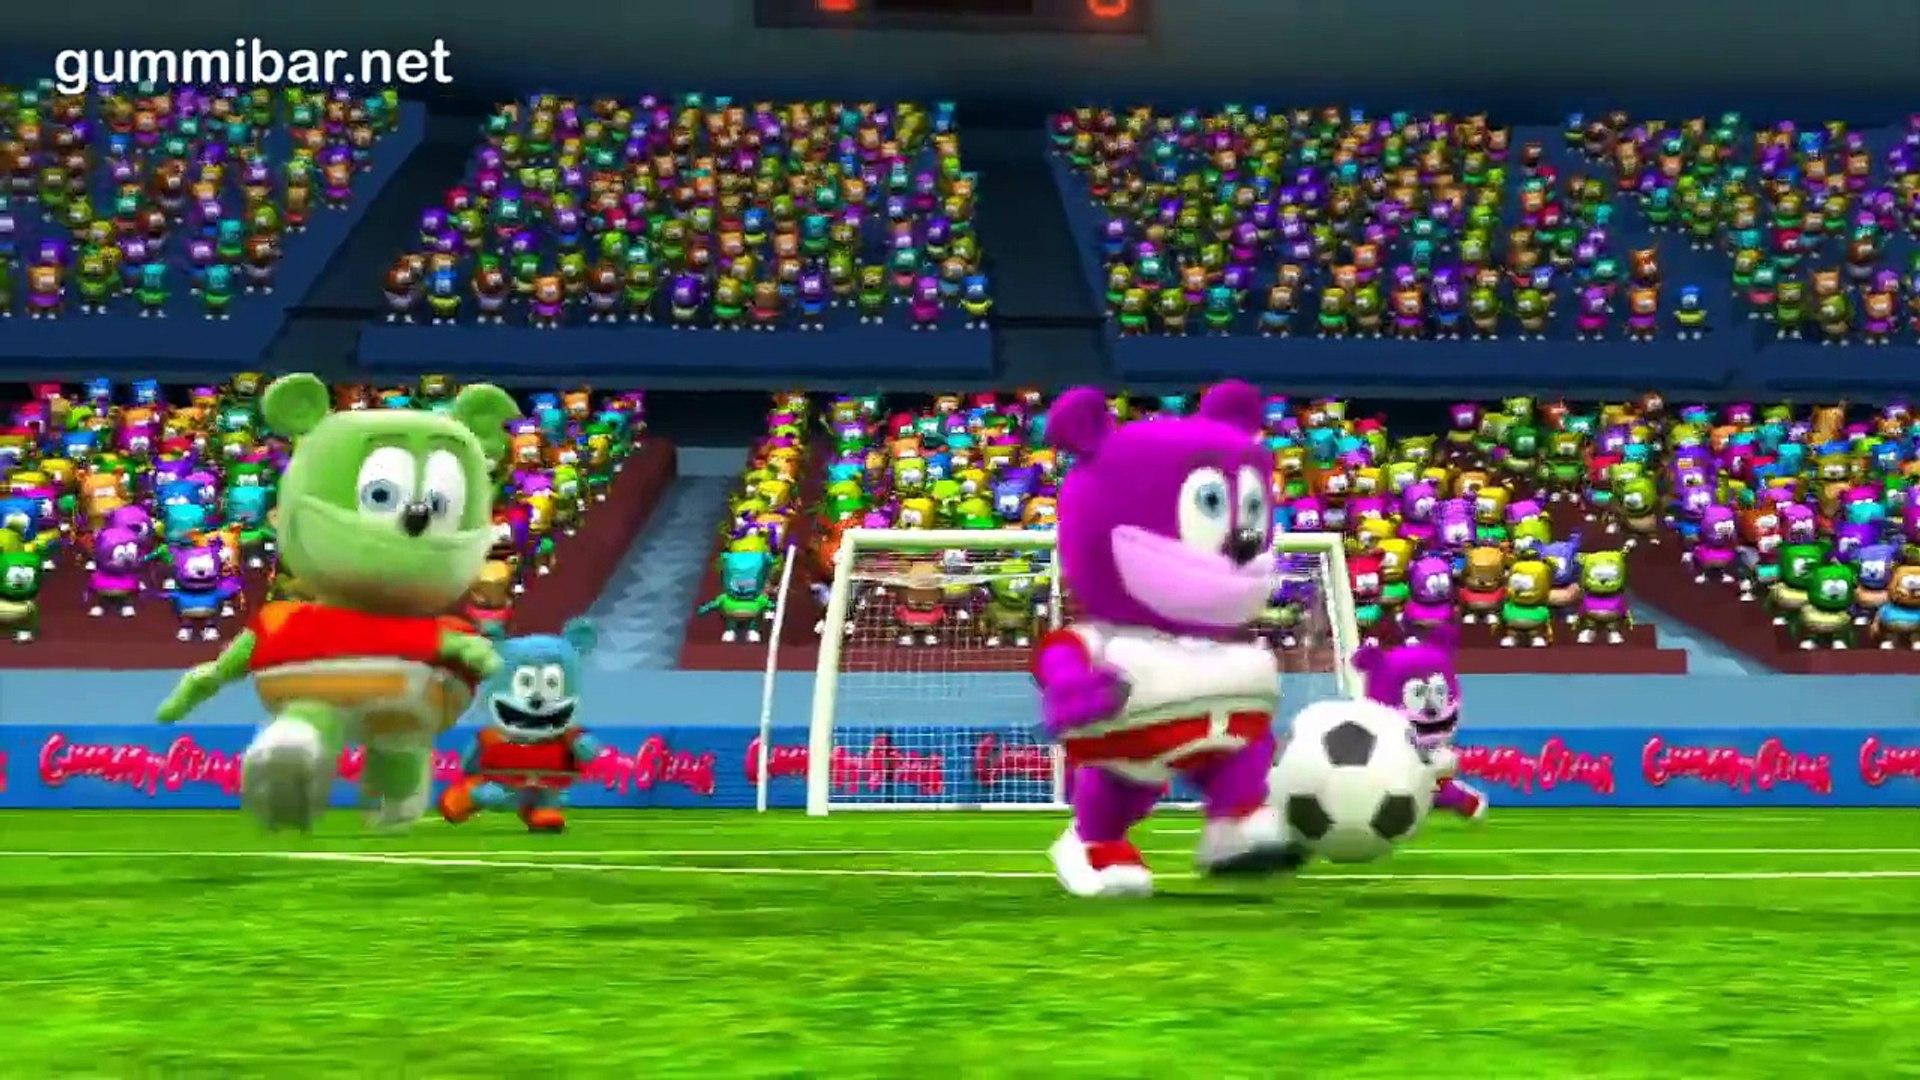 Gummibär Δεν Σταματώ Go For The Goal World Cup Soccer Song Greek Funny Gummy Bear Greece